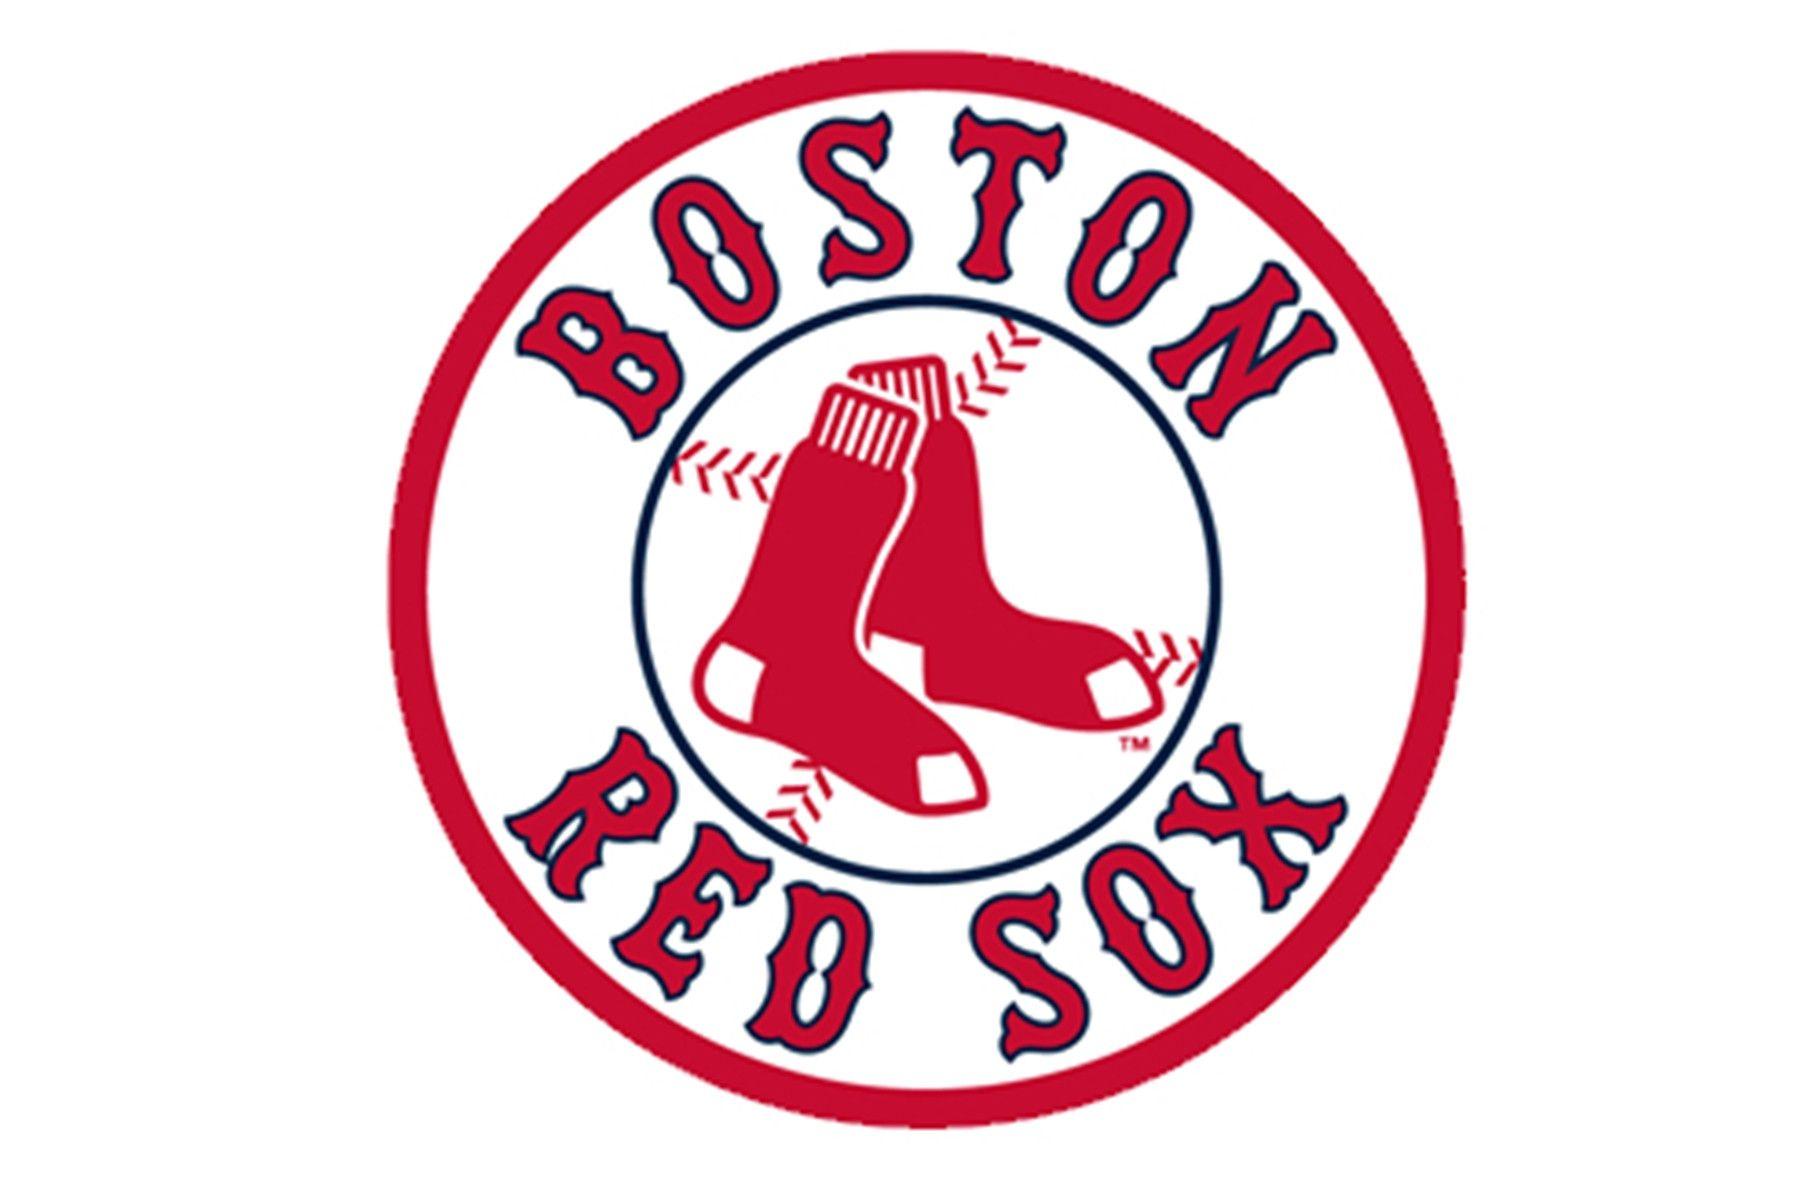 Boston Red Sox Vector Logo